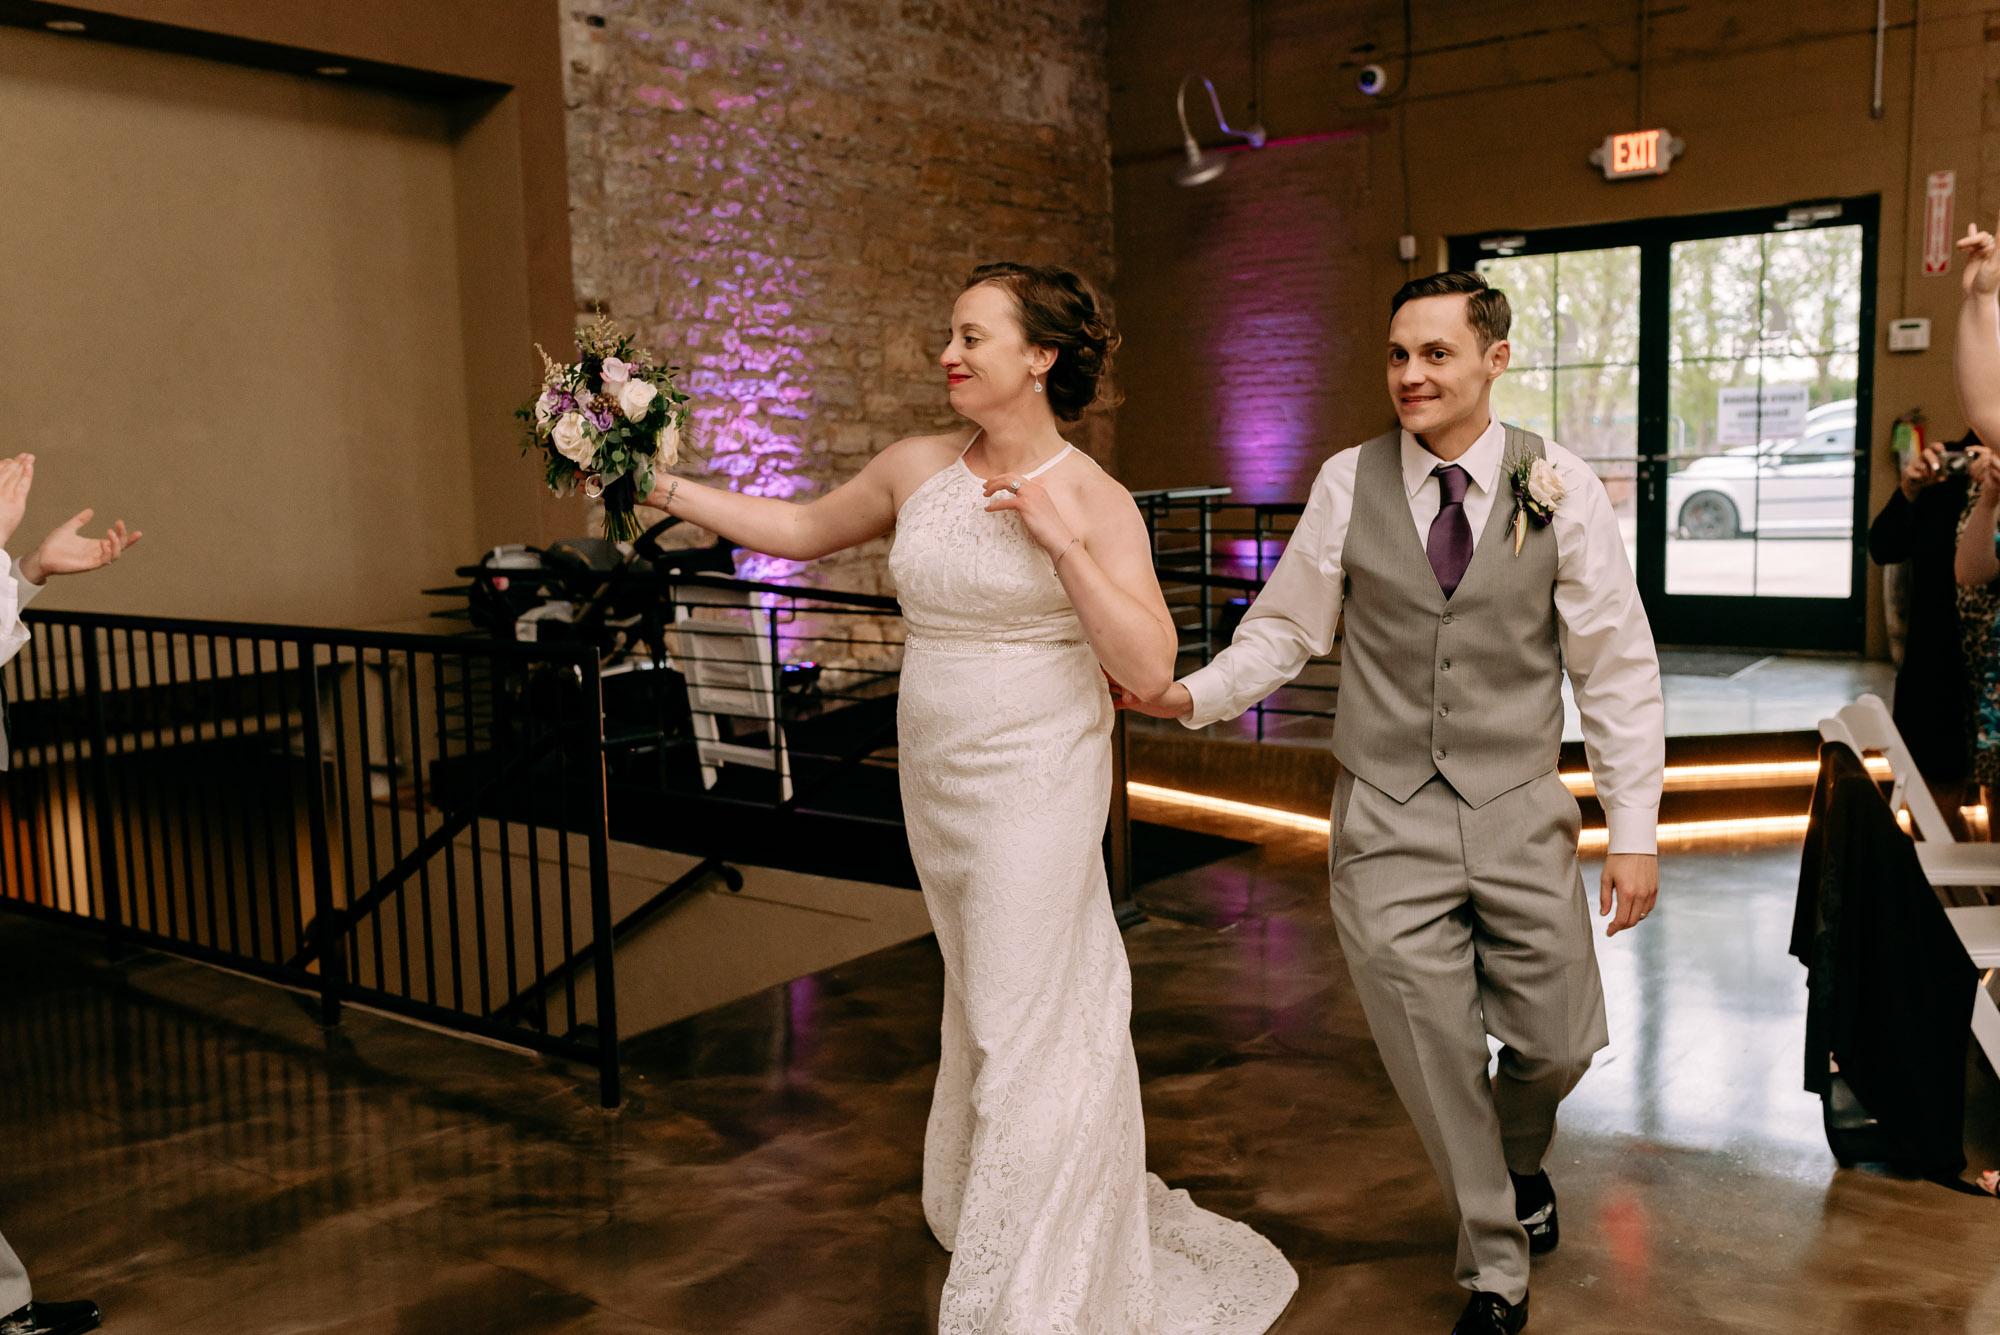 prairie-street-brewhouse-wedding-Rockford-IL-wedding-photographers-249.jpg